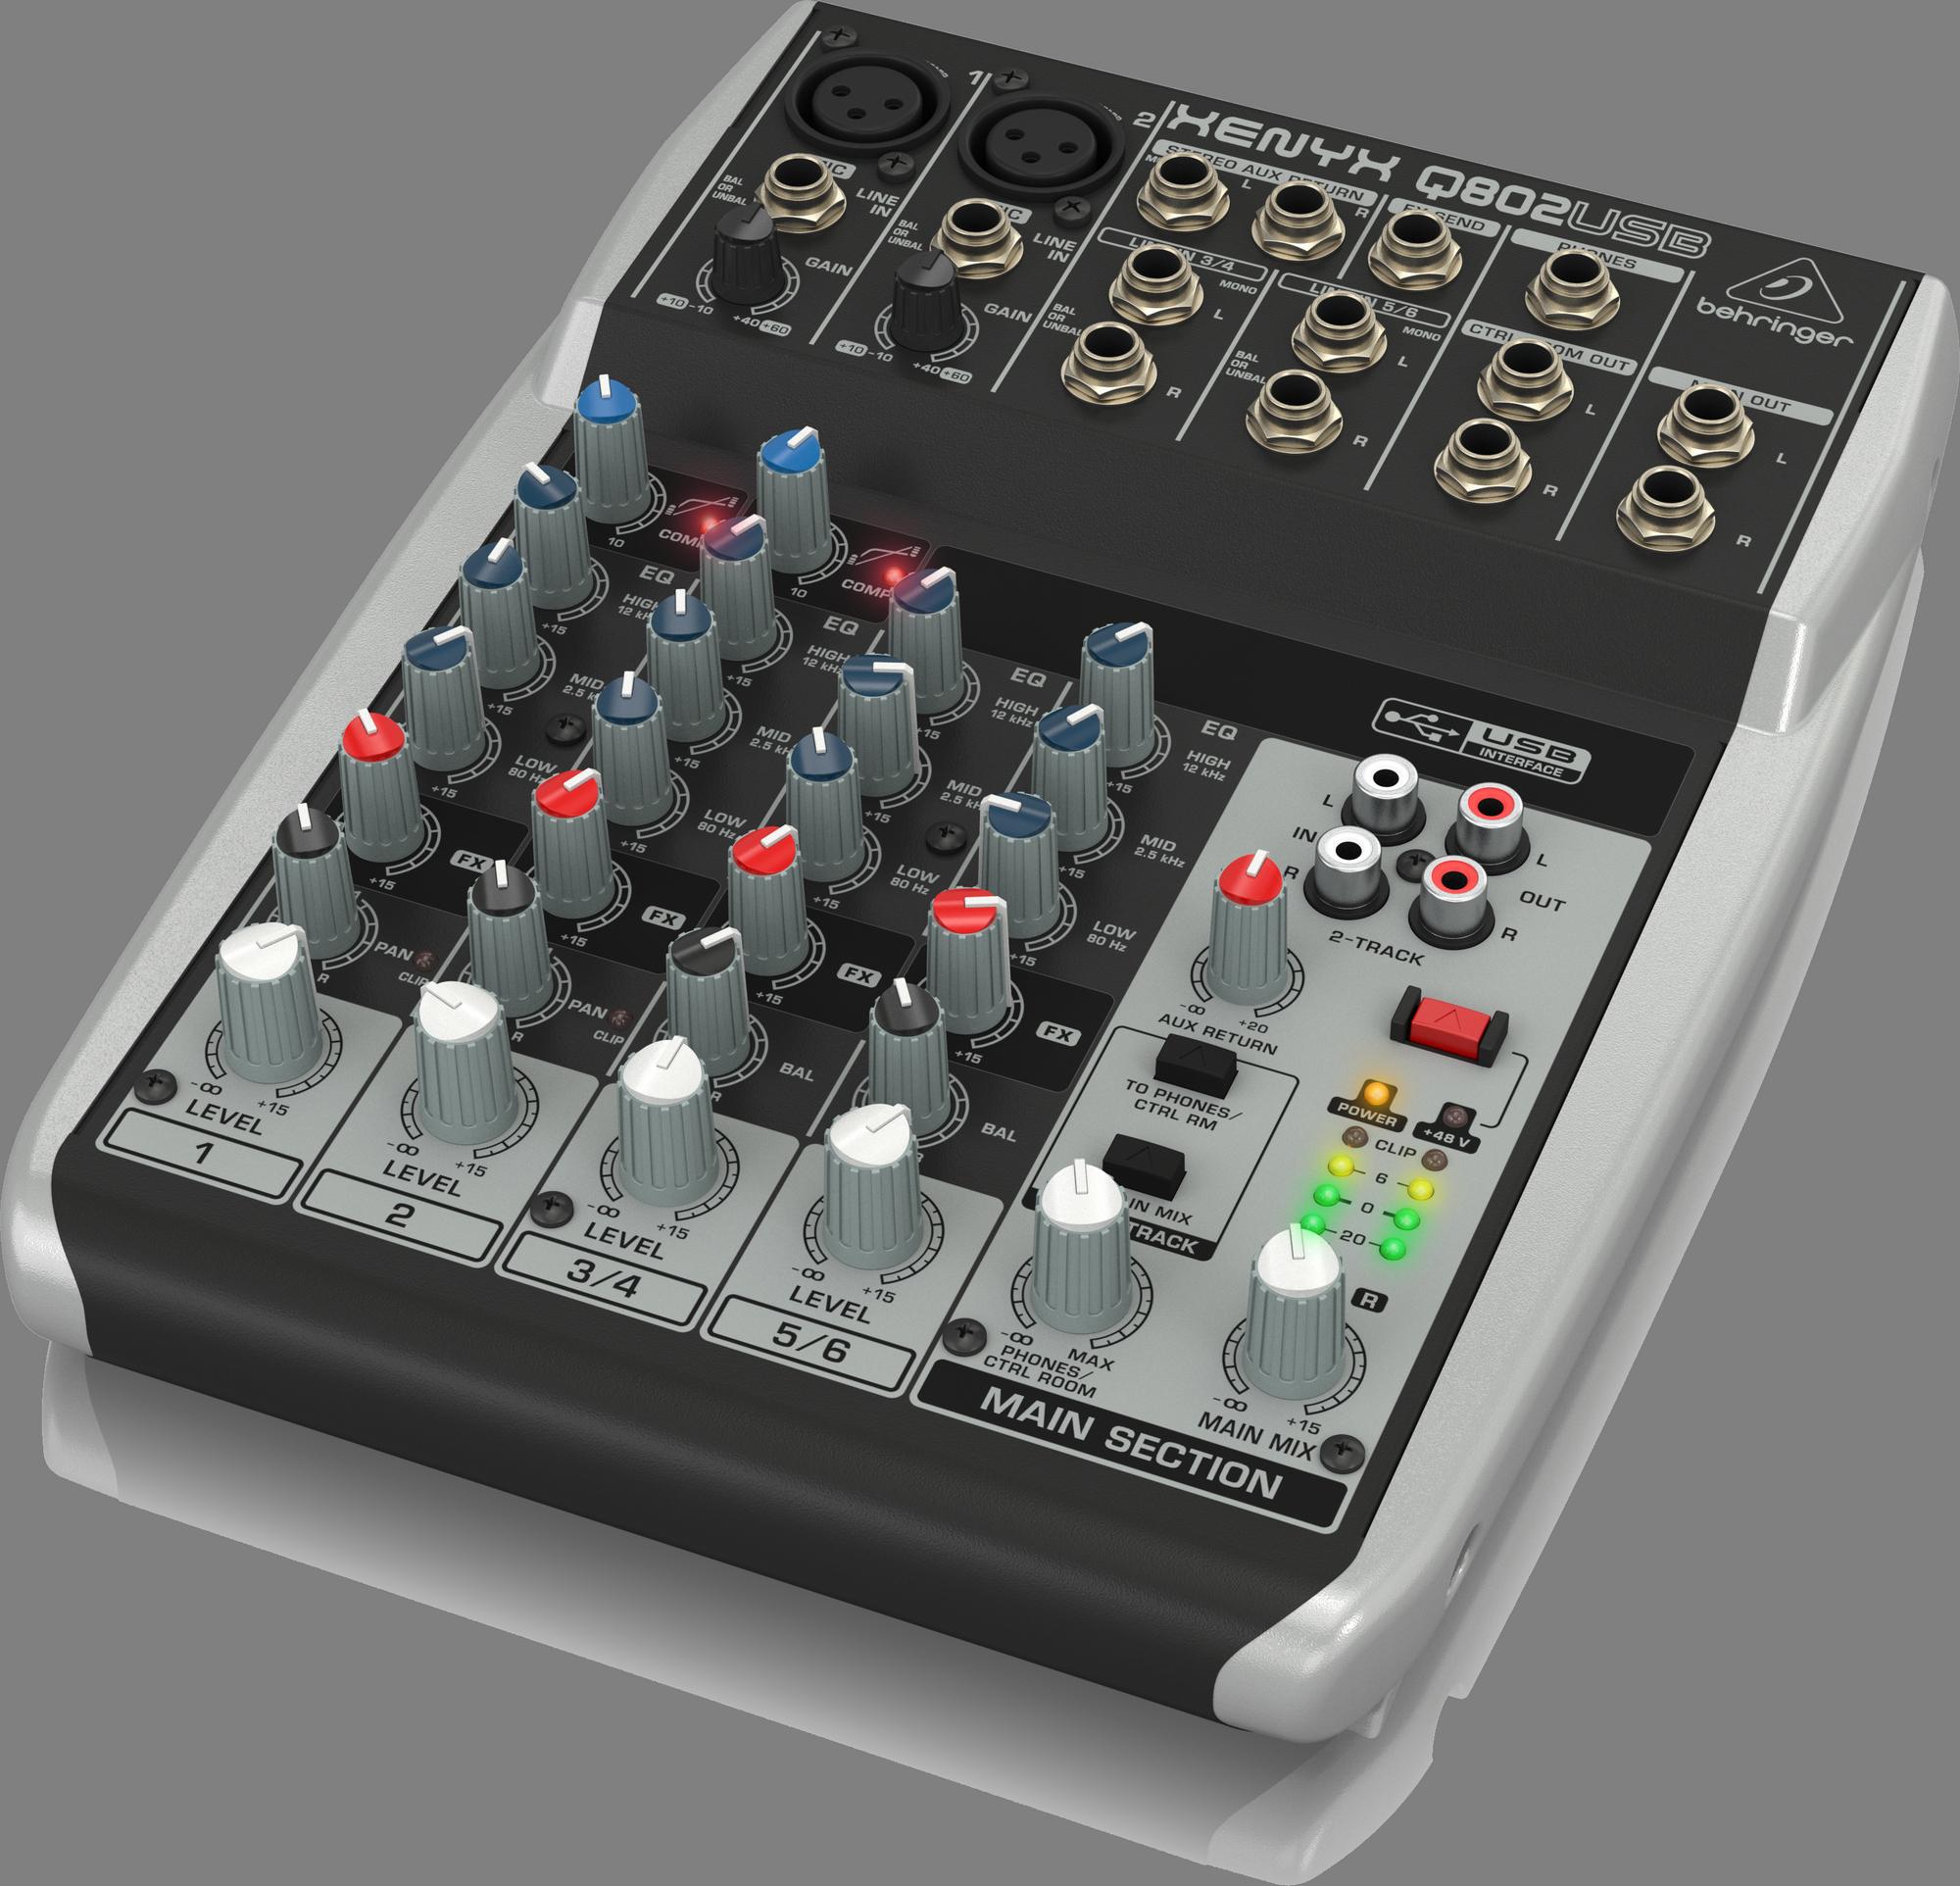 Behringer XENYX Q802USB - Mixing console